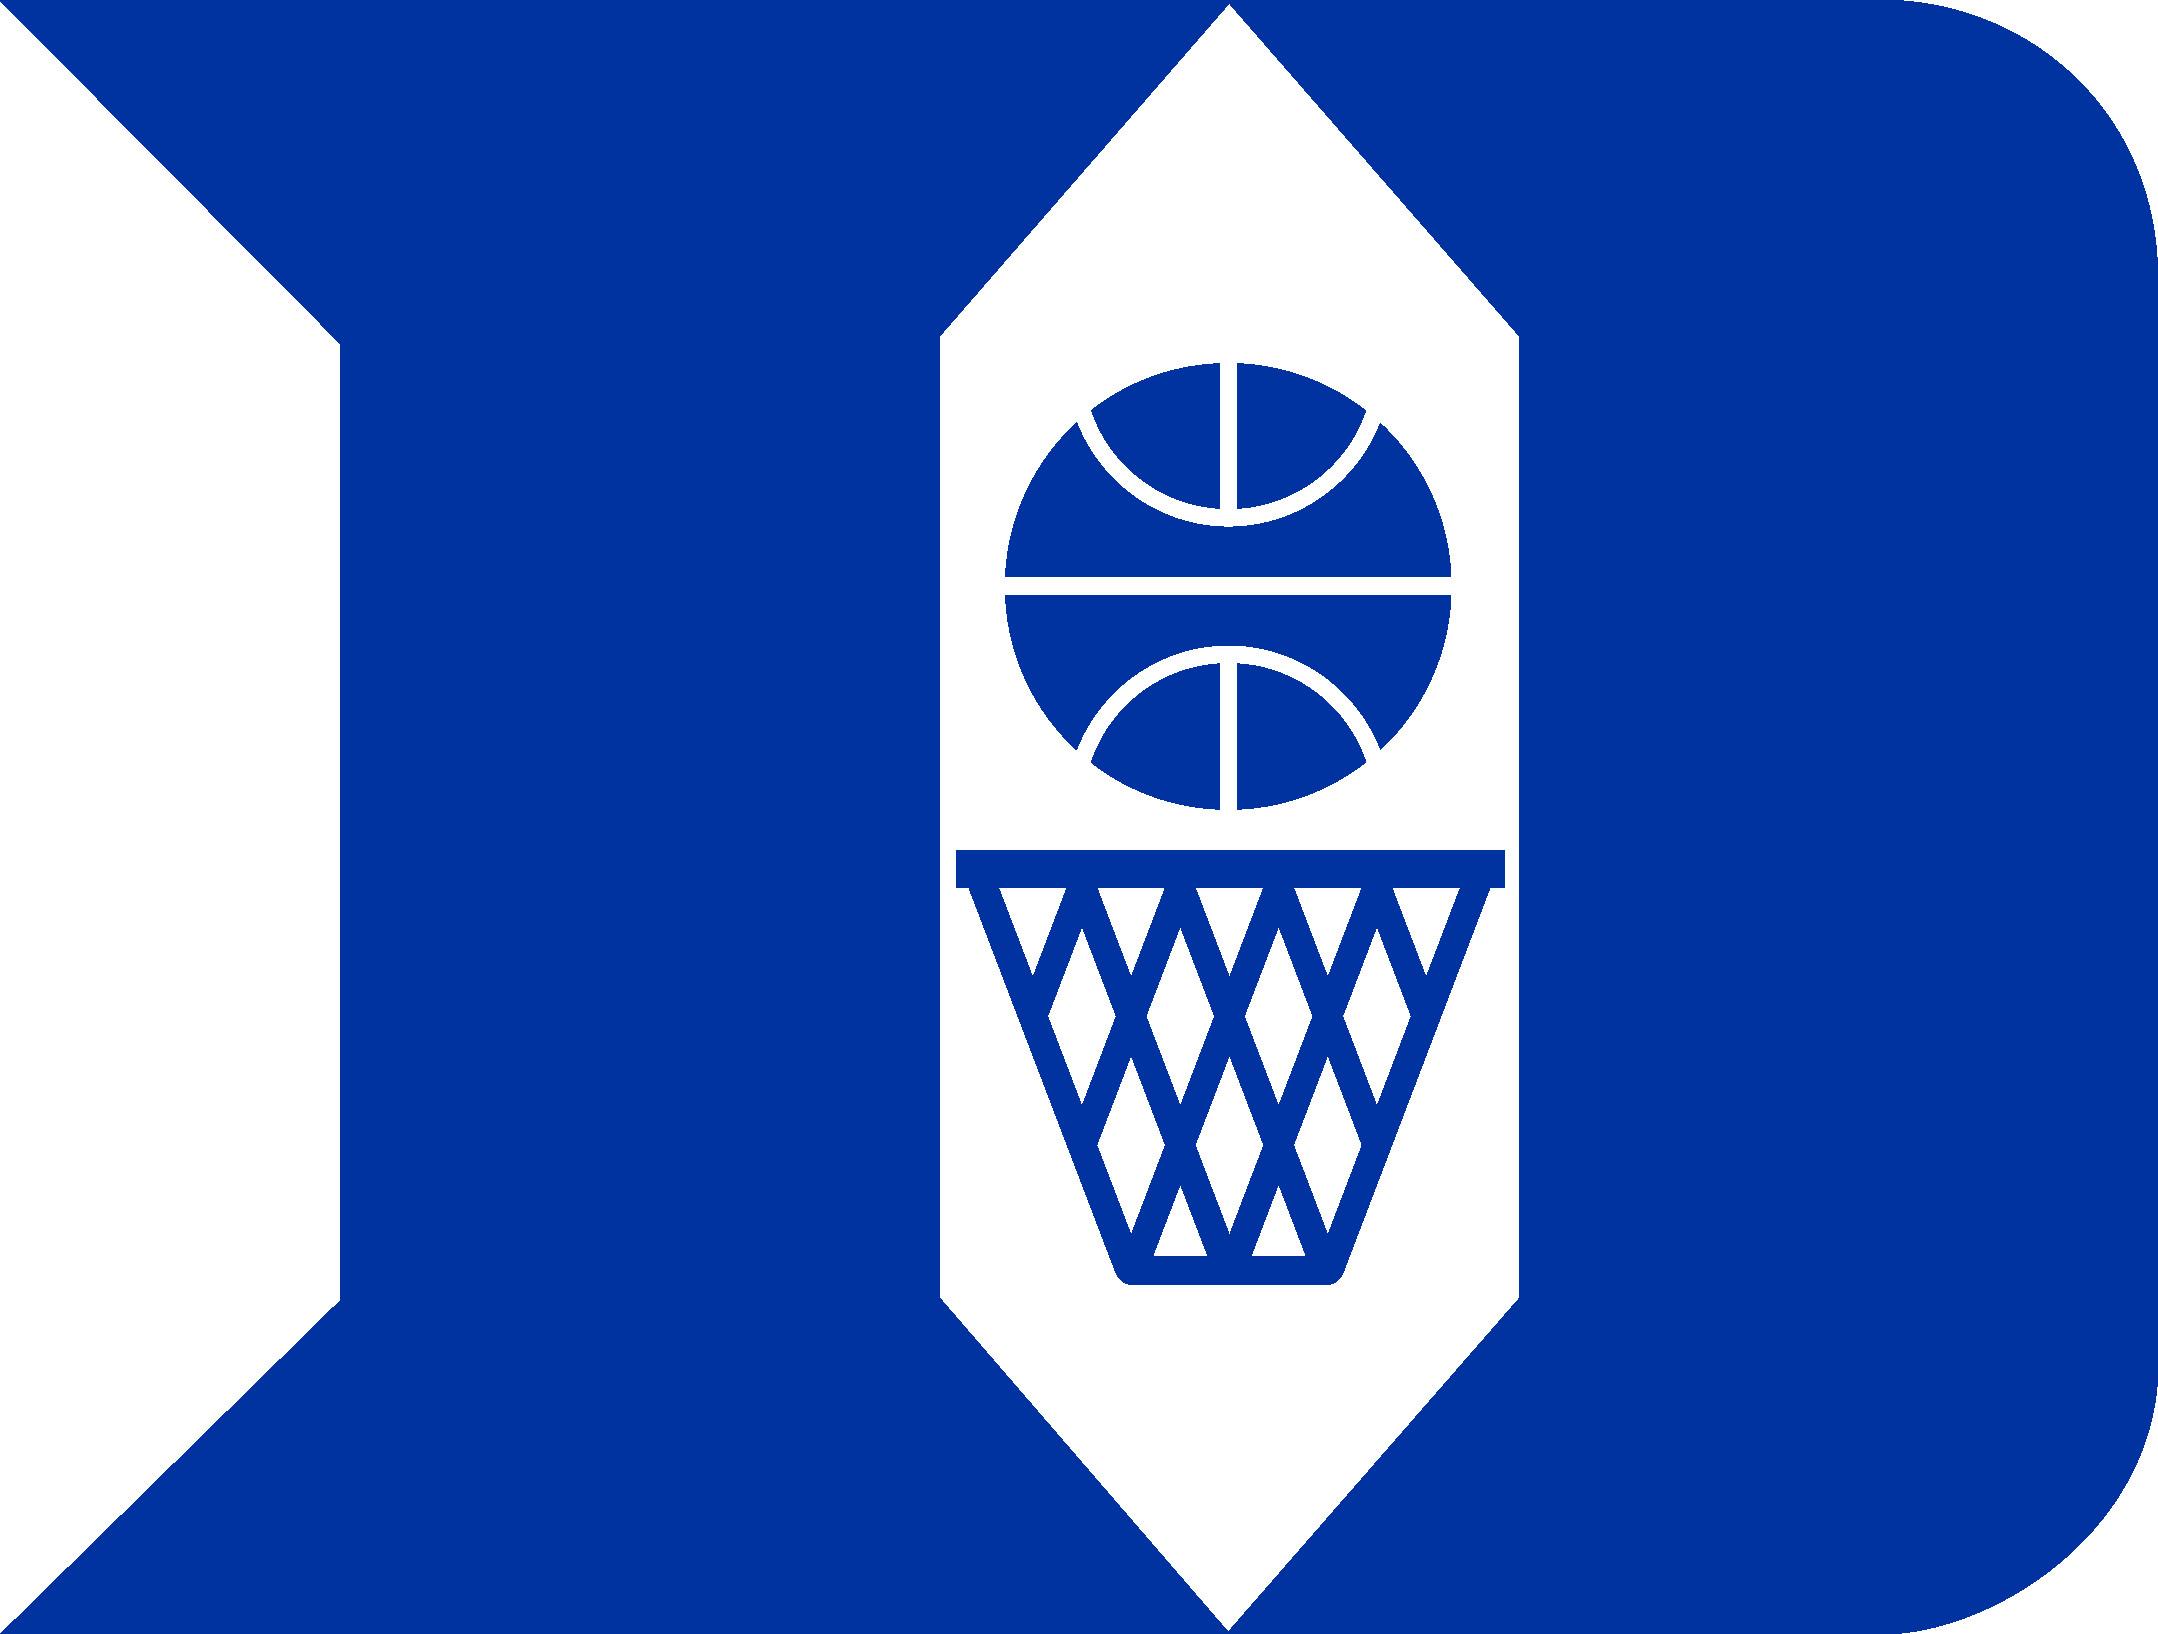 Duke Blue Devils Hd Wallpaper 70 Images